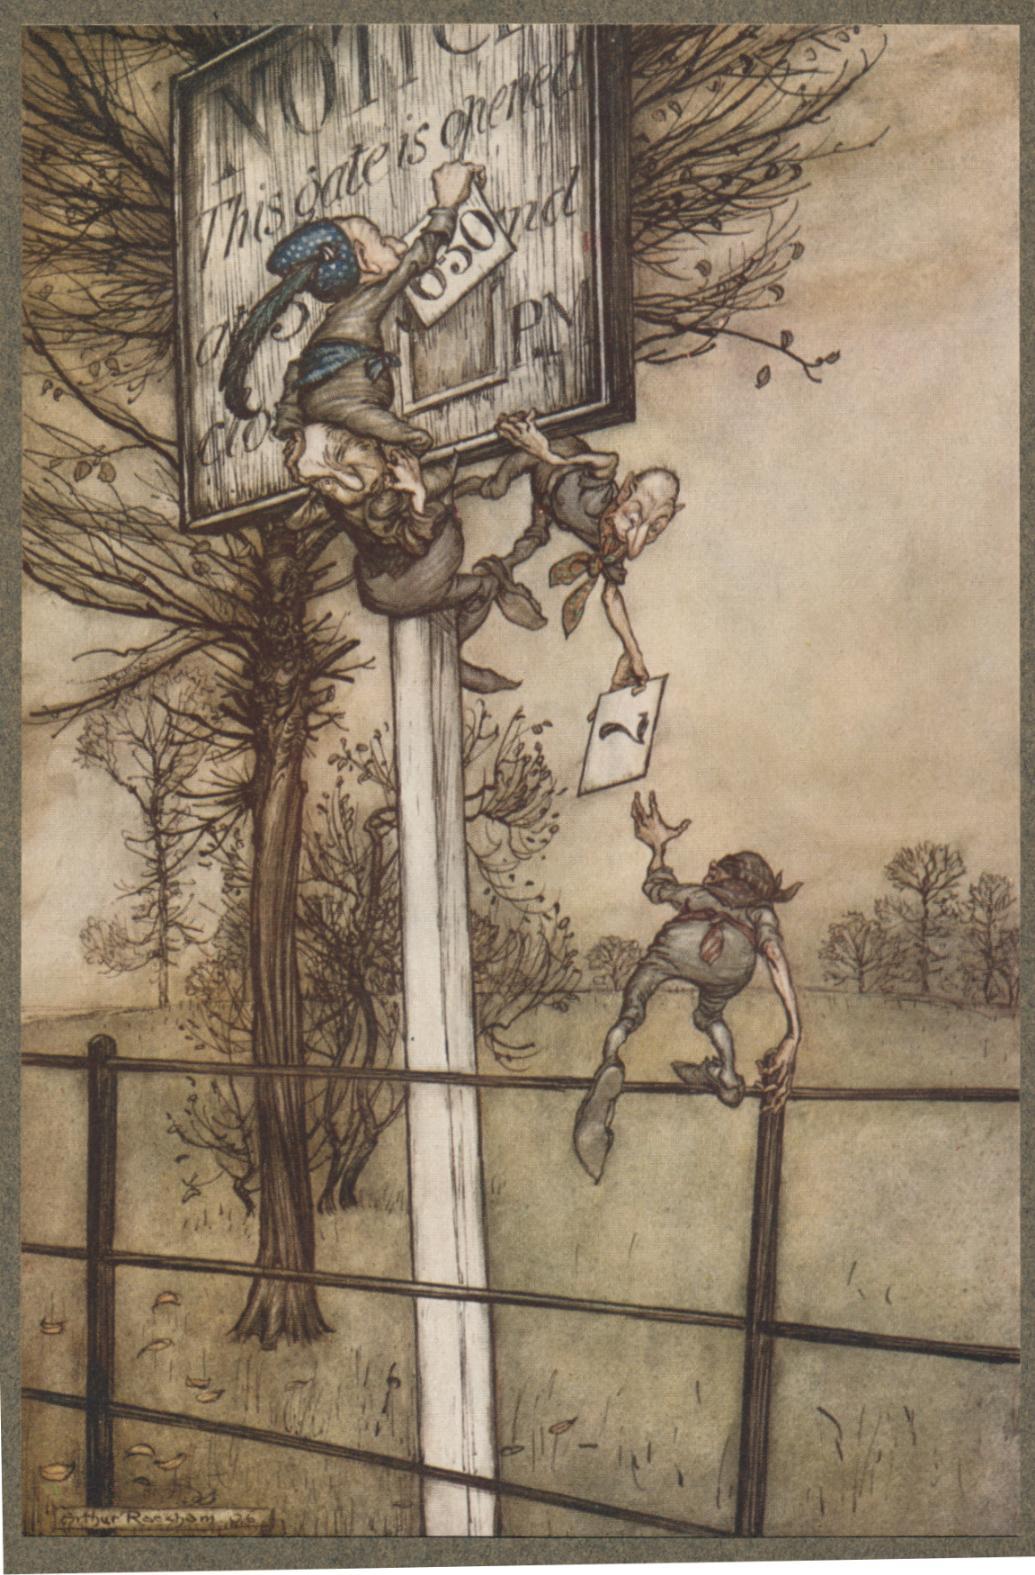 Arthur Rackham, Peter Pan in Kensington Gardens